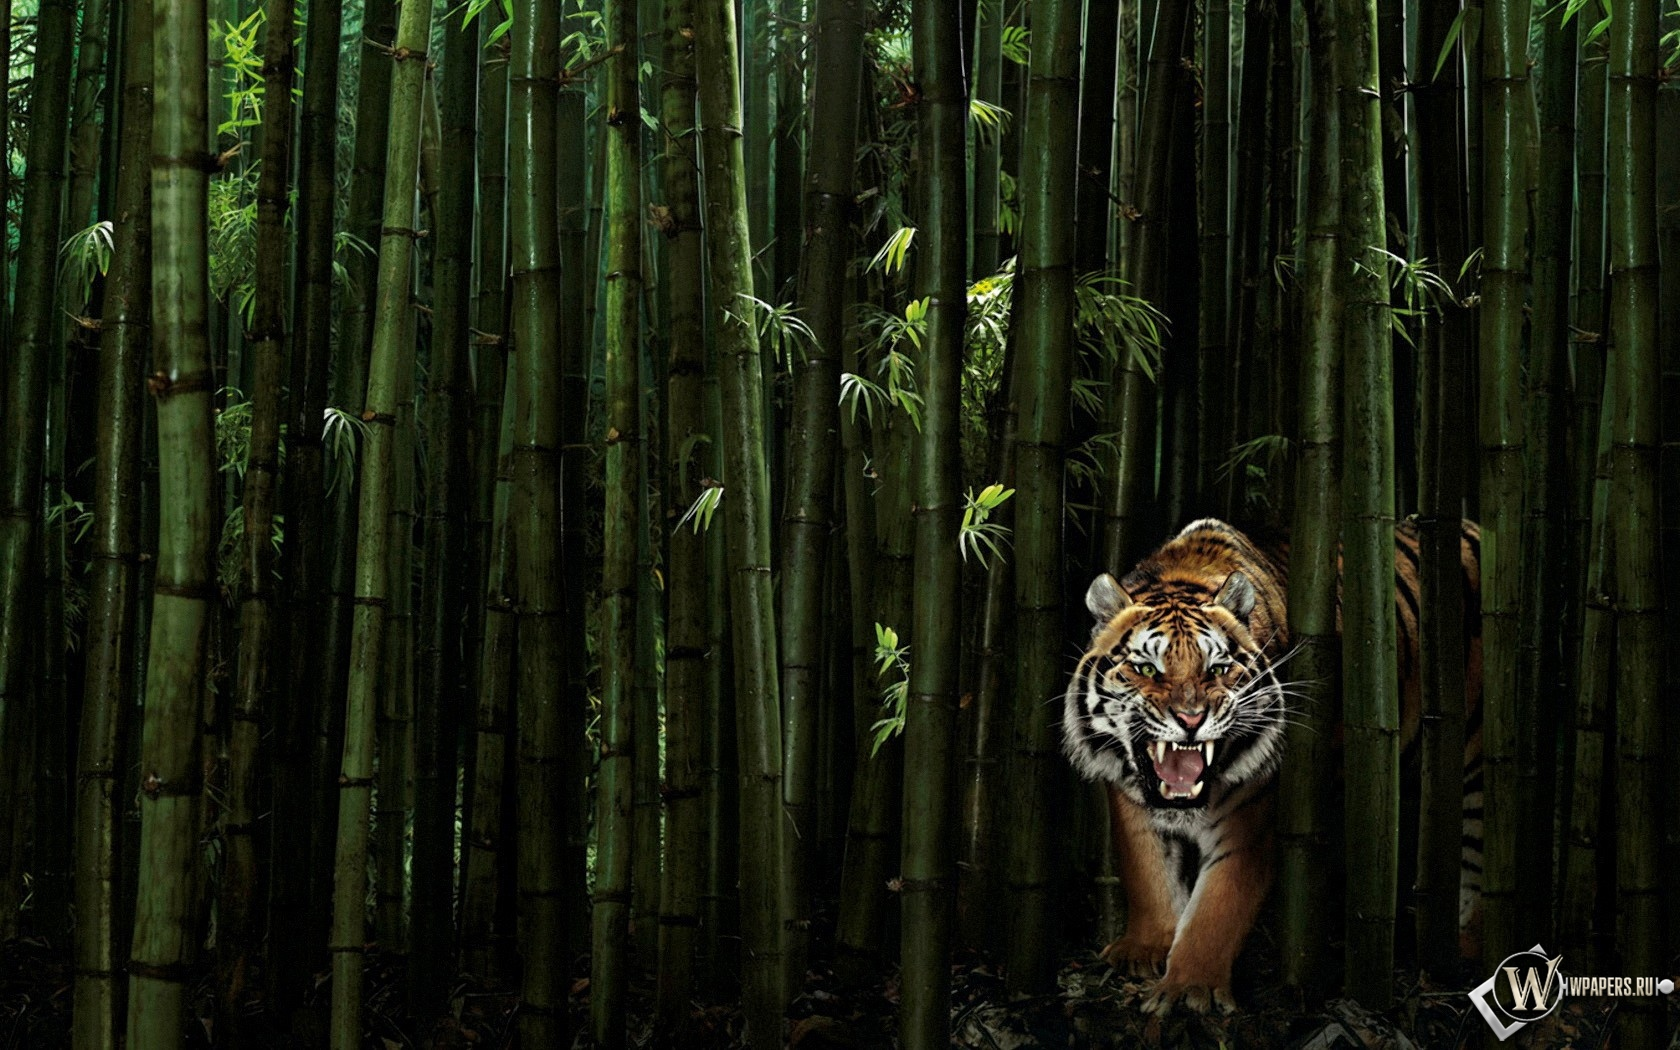 Тигр в бамбуке 1680x1050